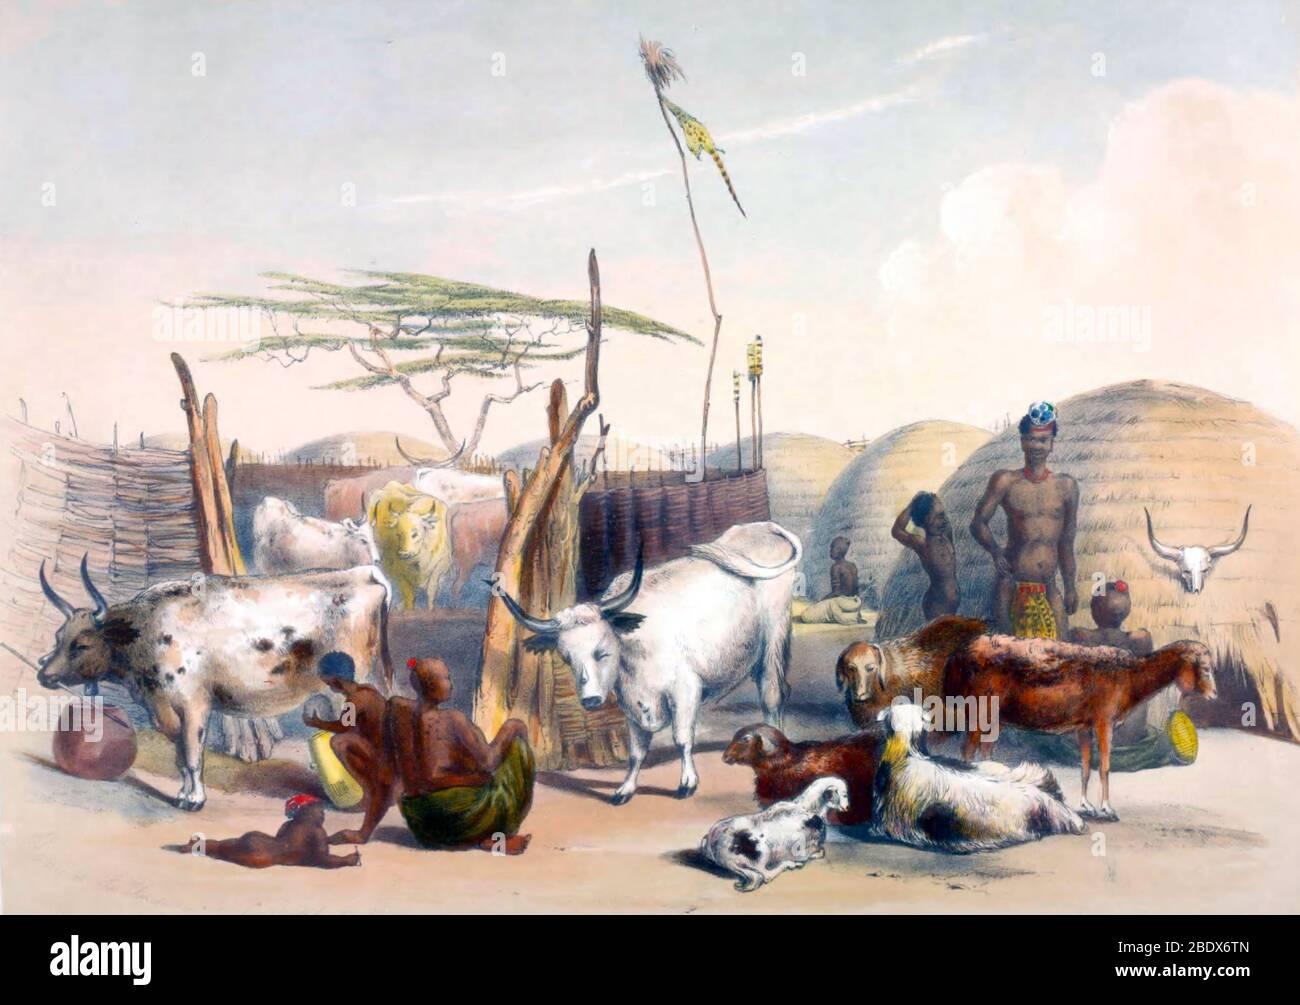 South Africa, Zulu Kraal, 1840s Stock Photo